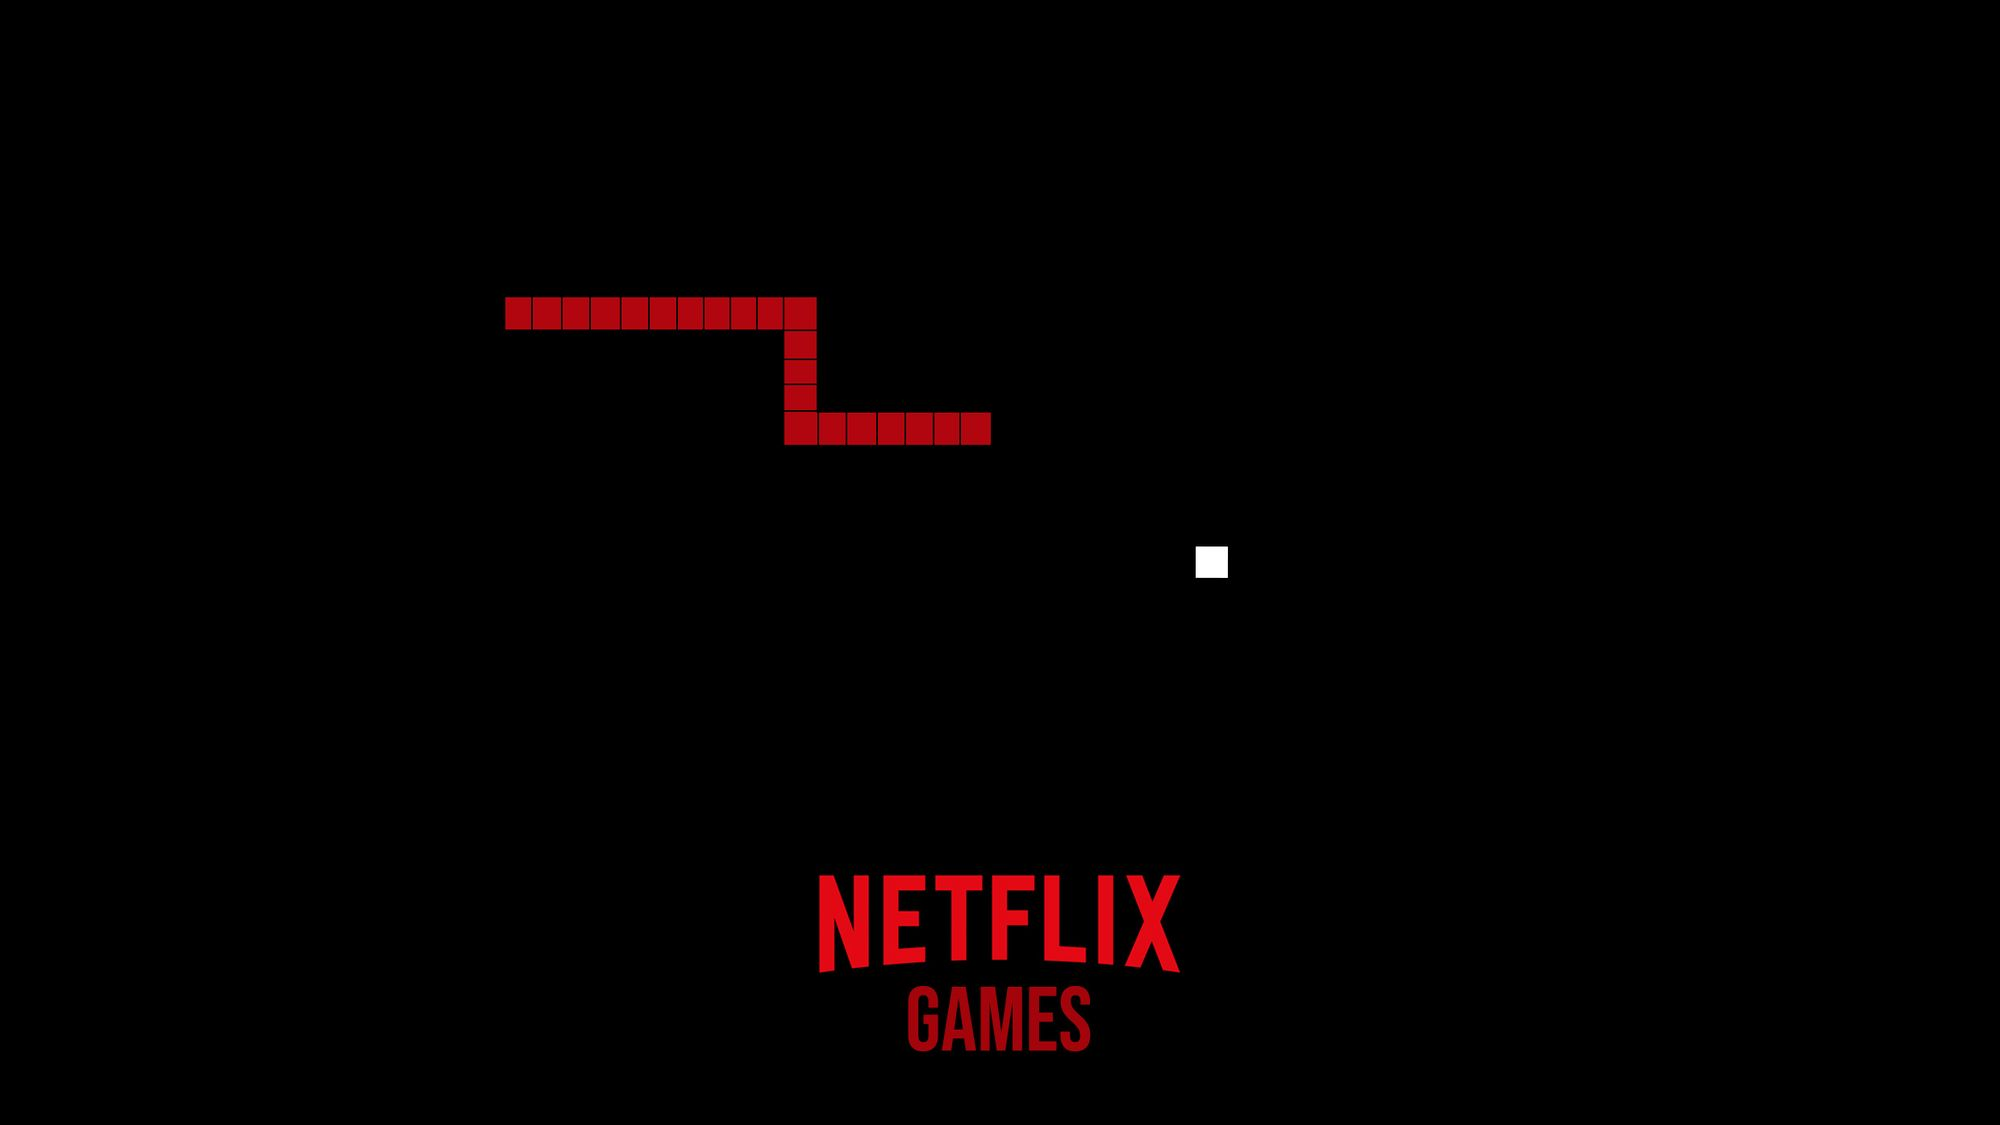 Netflix will start producing games? What?